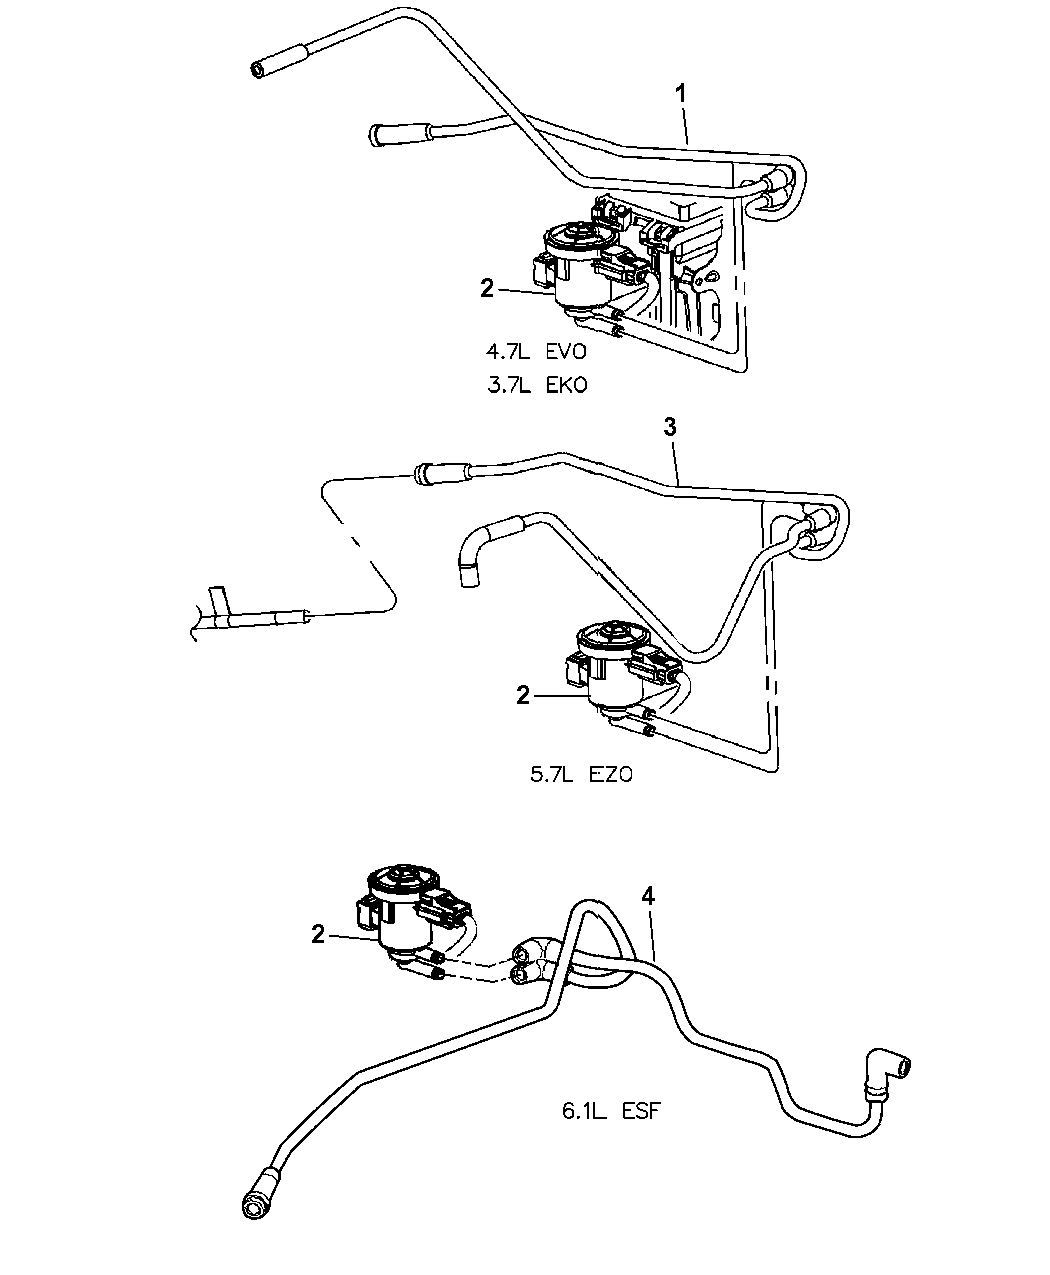 Jeep Grand Cherokee Emission Control Vacuum Harness